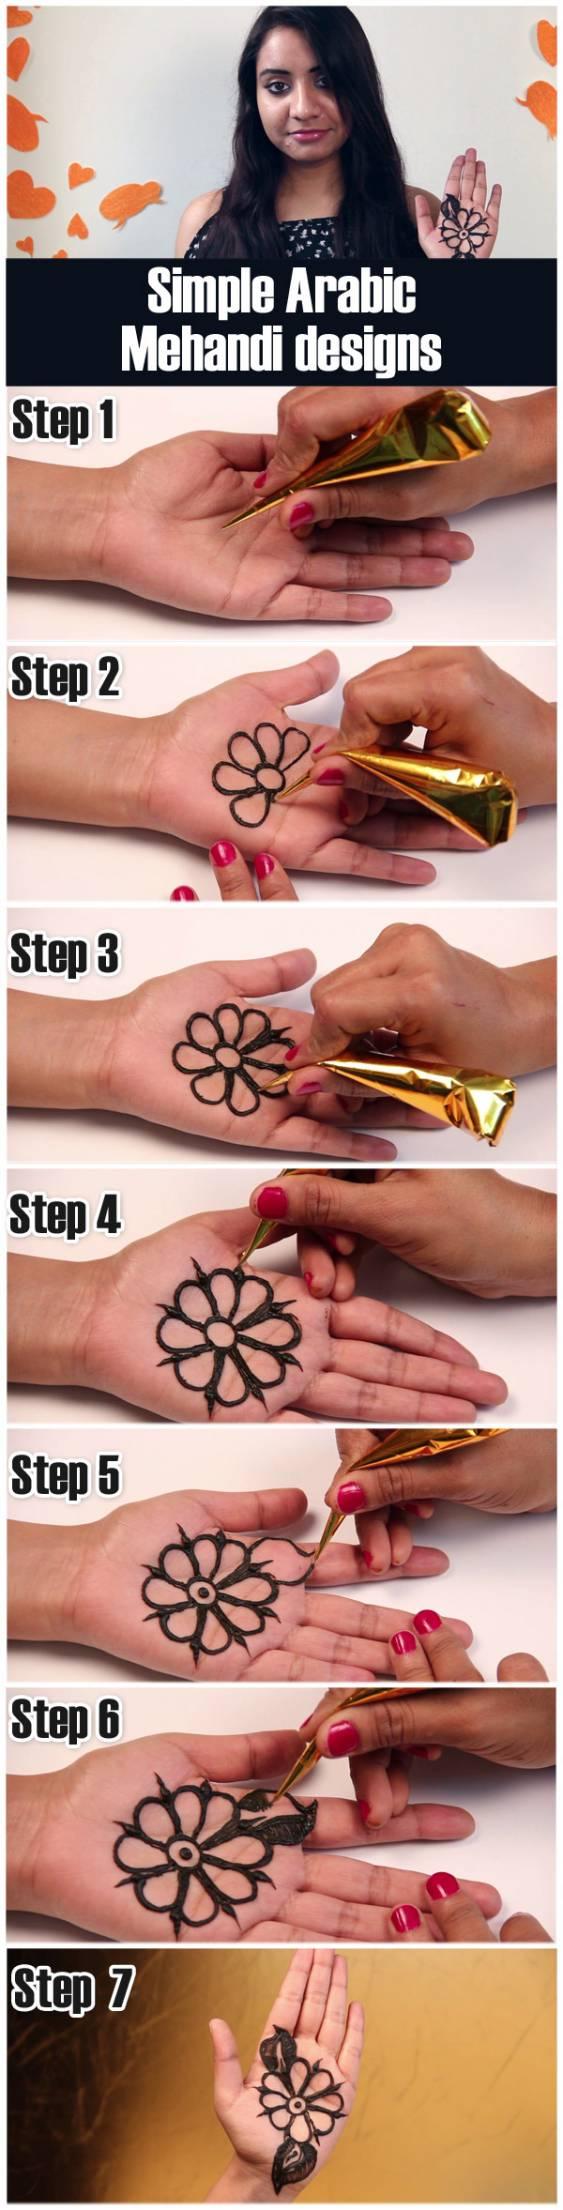 2 Simple Arabic Mehndi Design Tutorials For Stylecaster